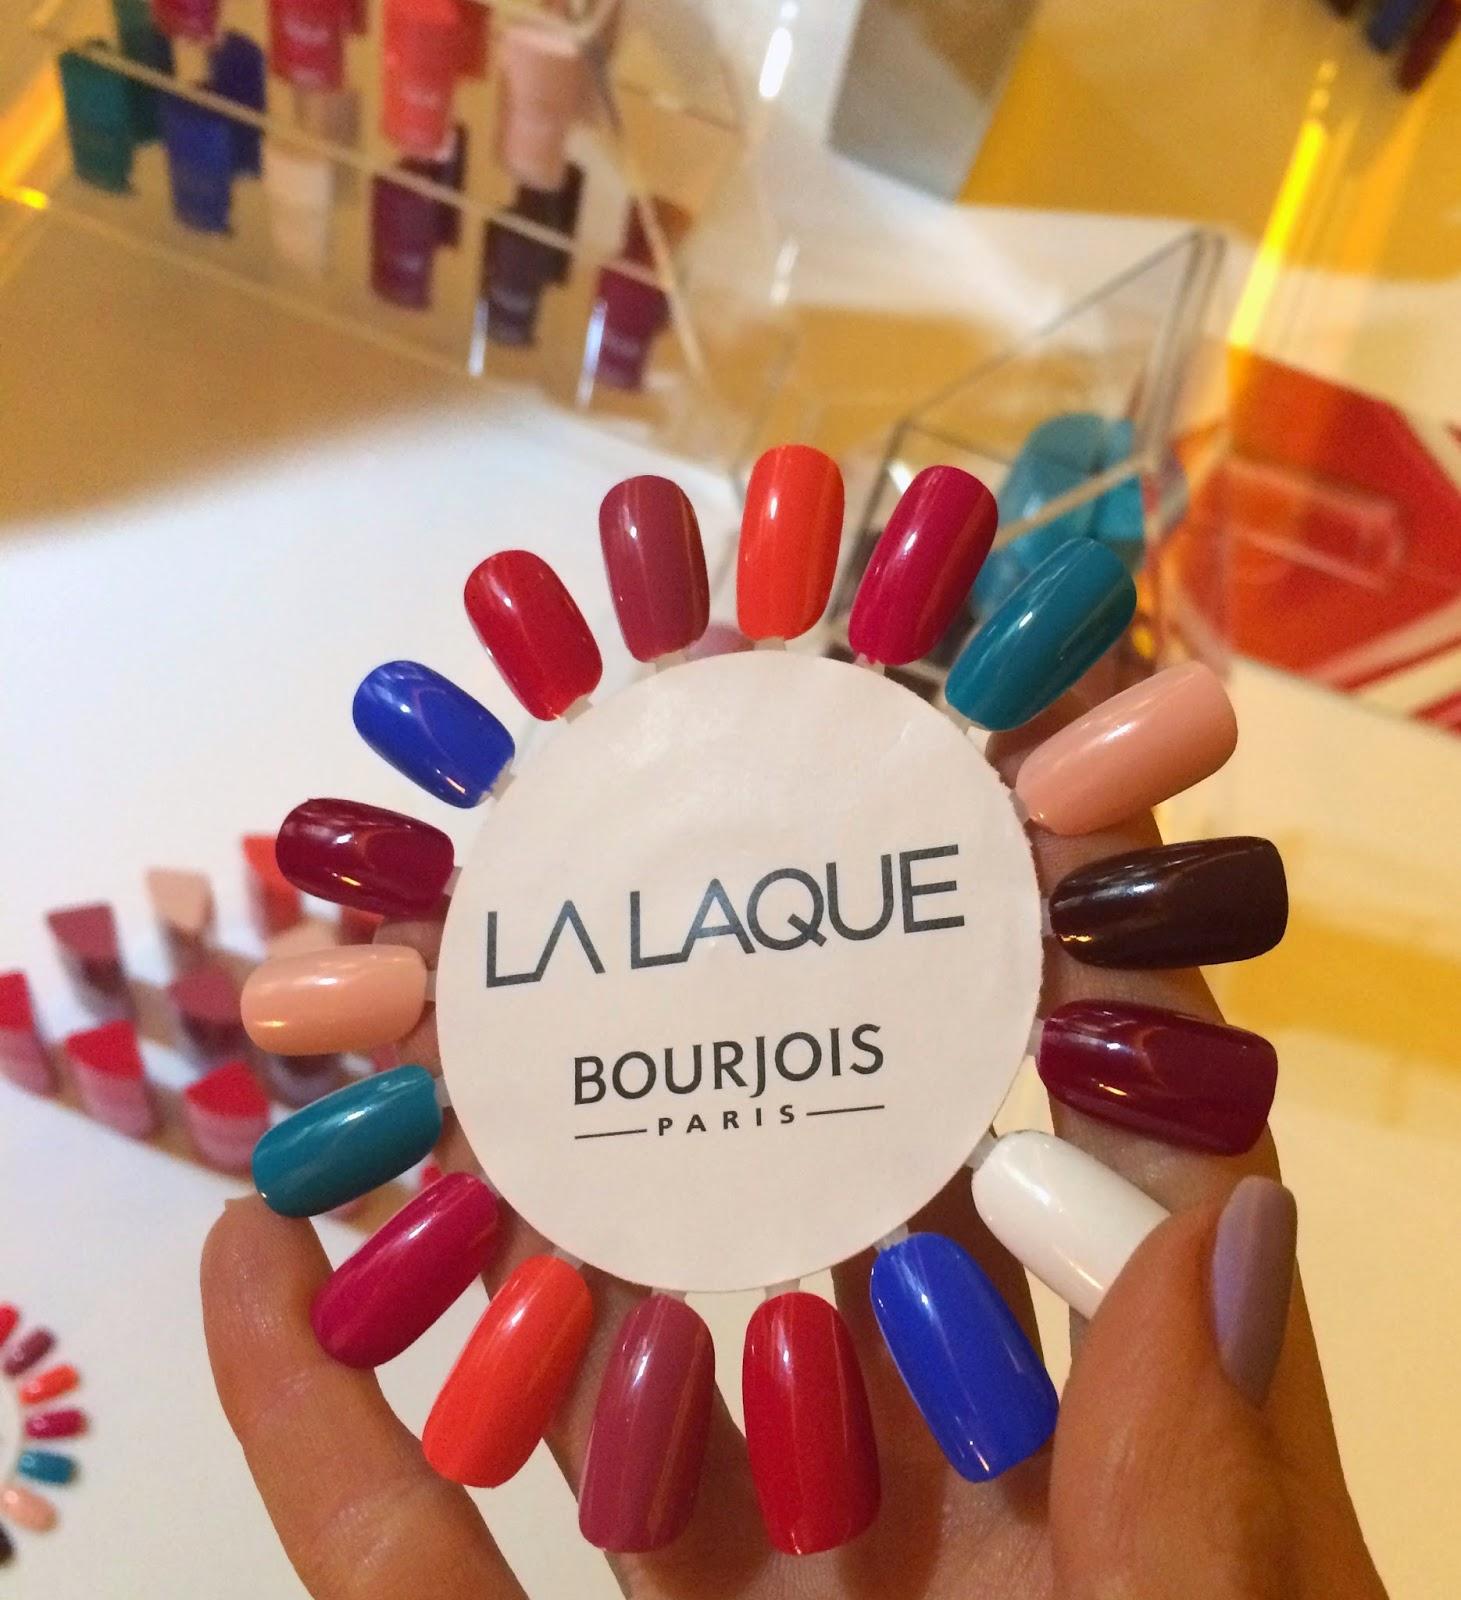 bourjois--2015-la-laque-nail-enamel-shades